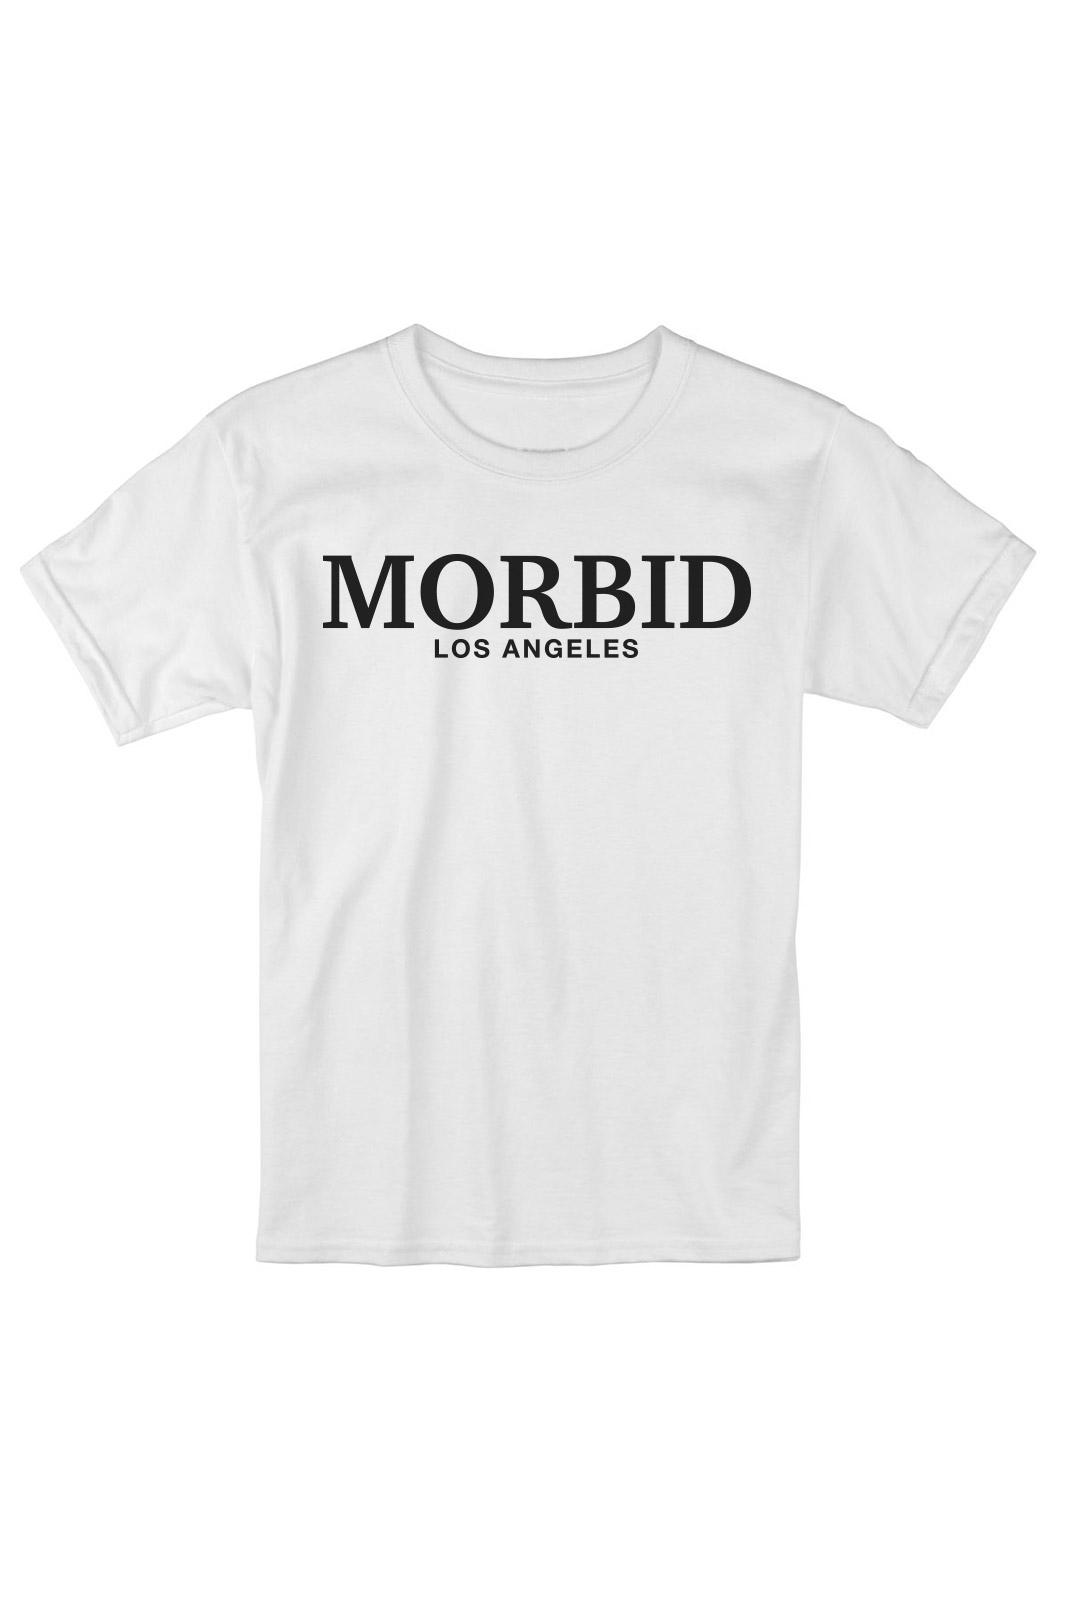 MORBID Los Angeles Clothing Streetwear Fancy Type White t-shirt